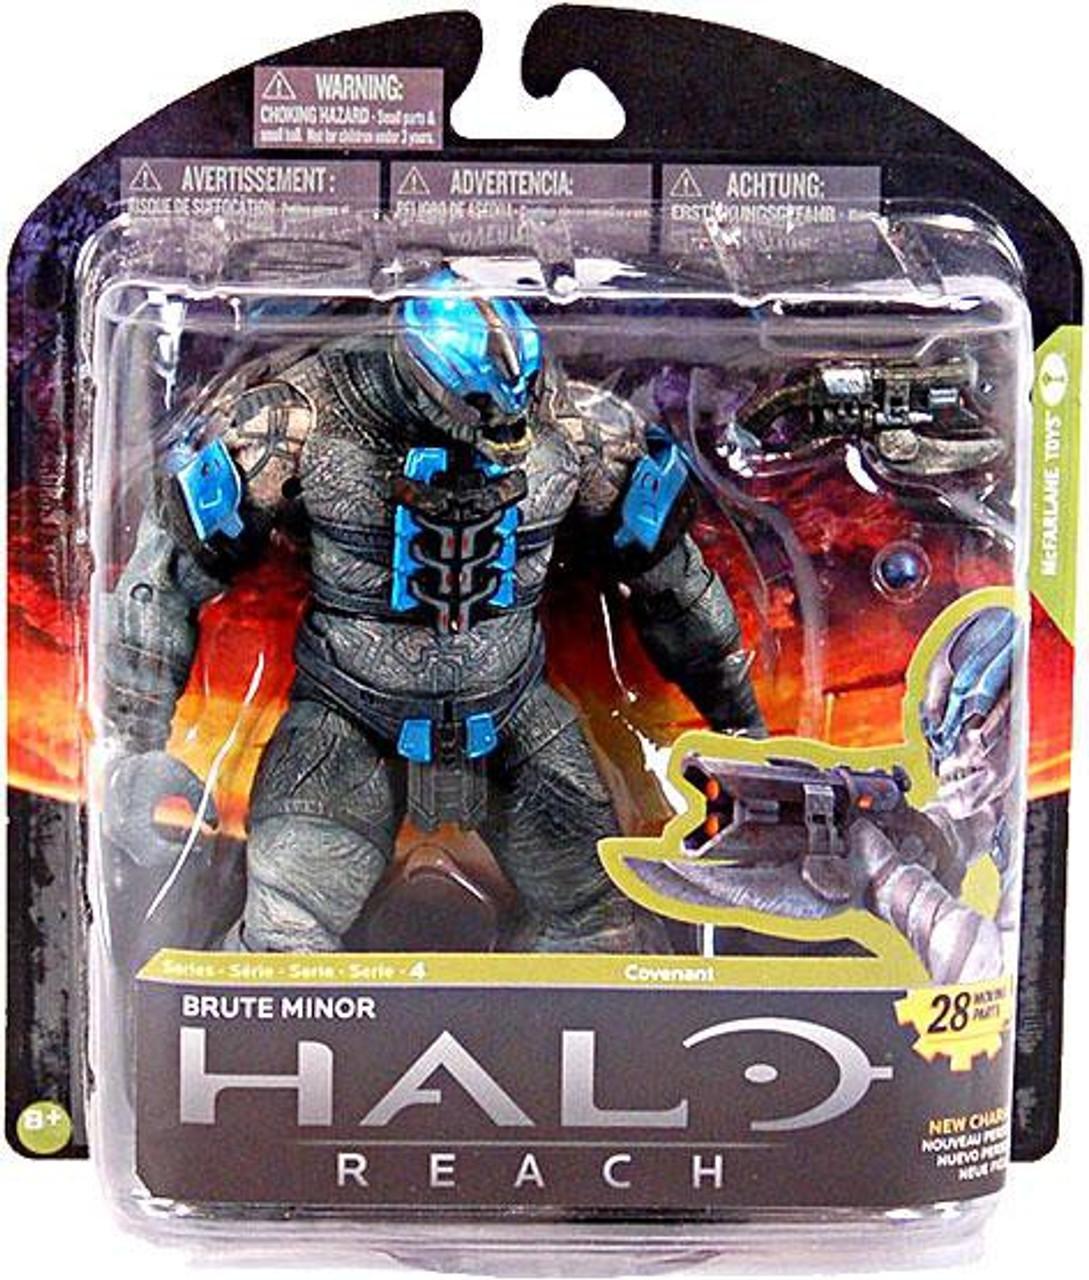 McFarlane Toys Halo Reach Series 4 Brute Minor Action Figure